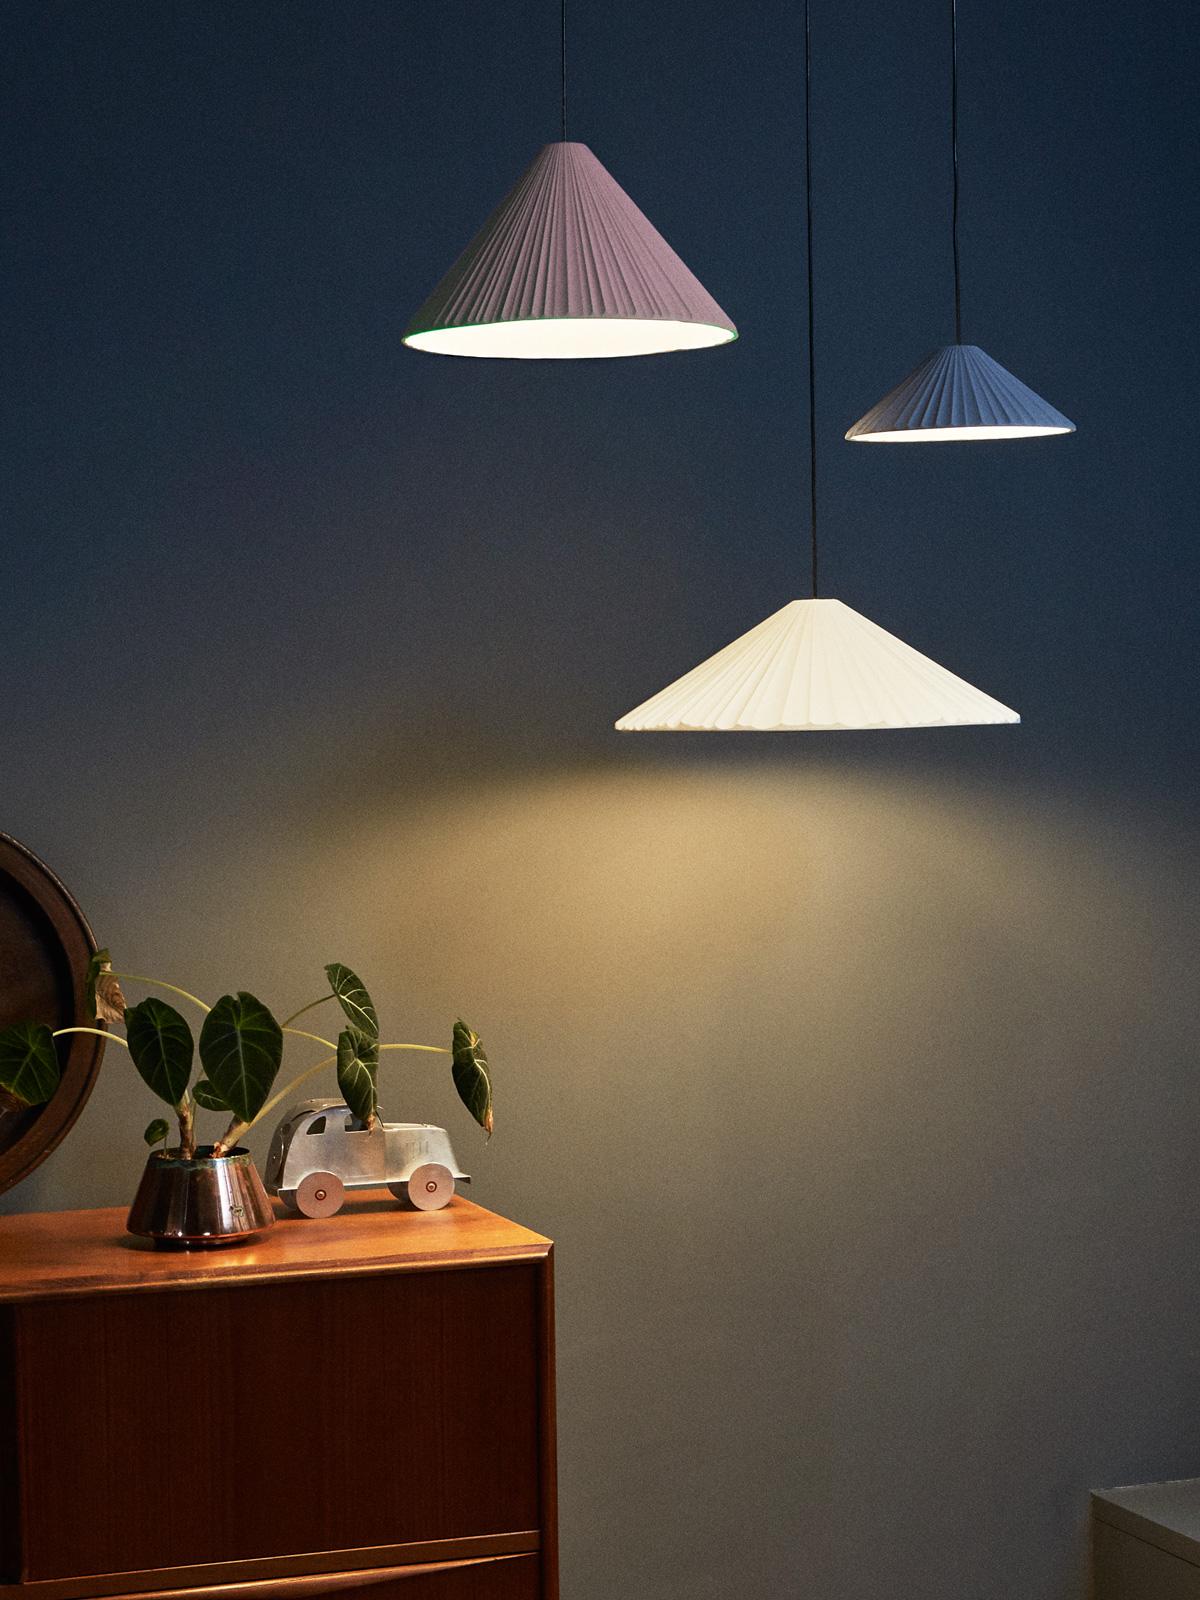 Pu-erh Marset Leuchte Keramik DesignOrt Onlineshop Lampen Berlin